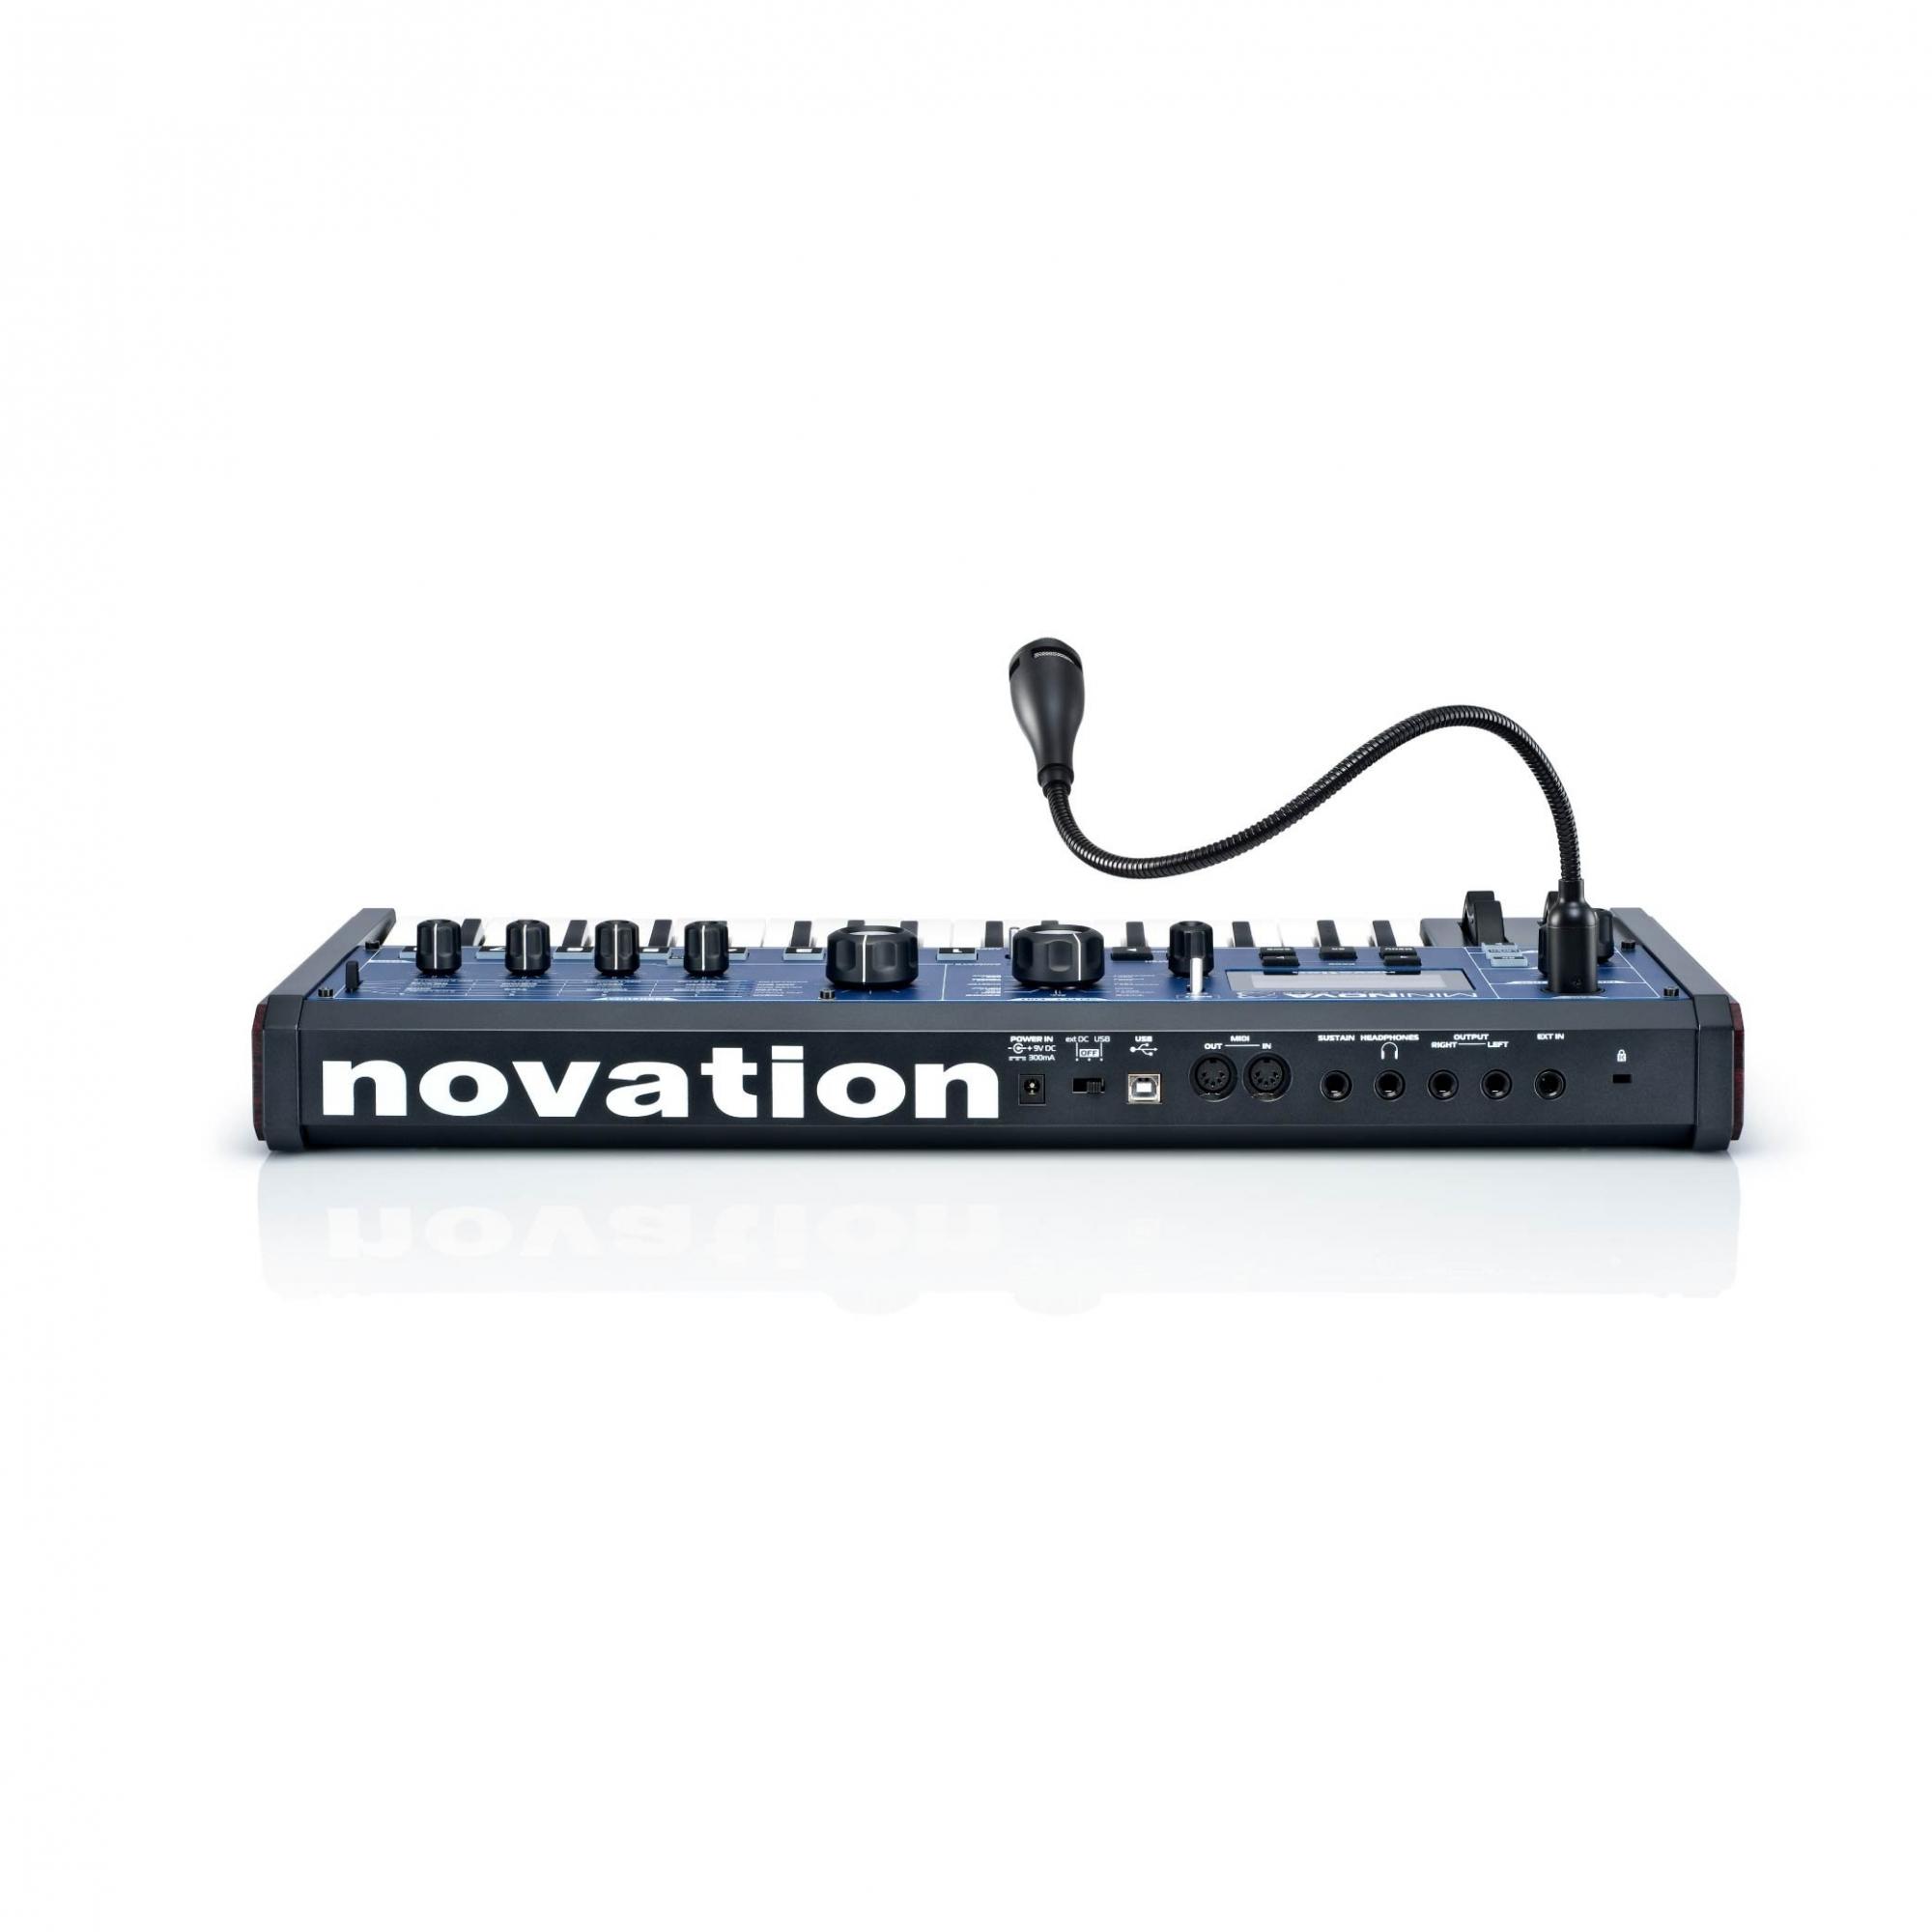 Novation MININOVA Sintetizador de 37 Teclas